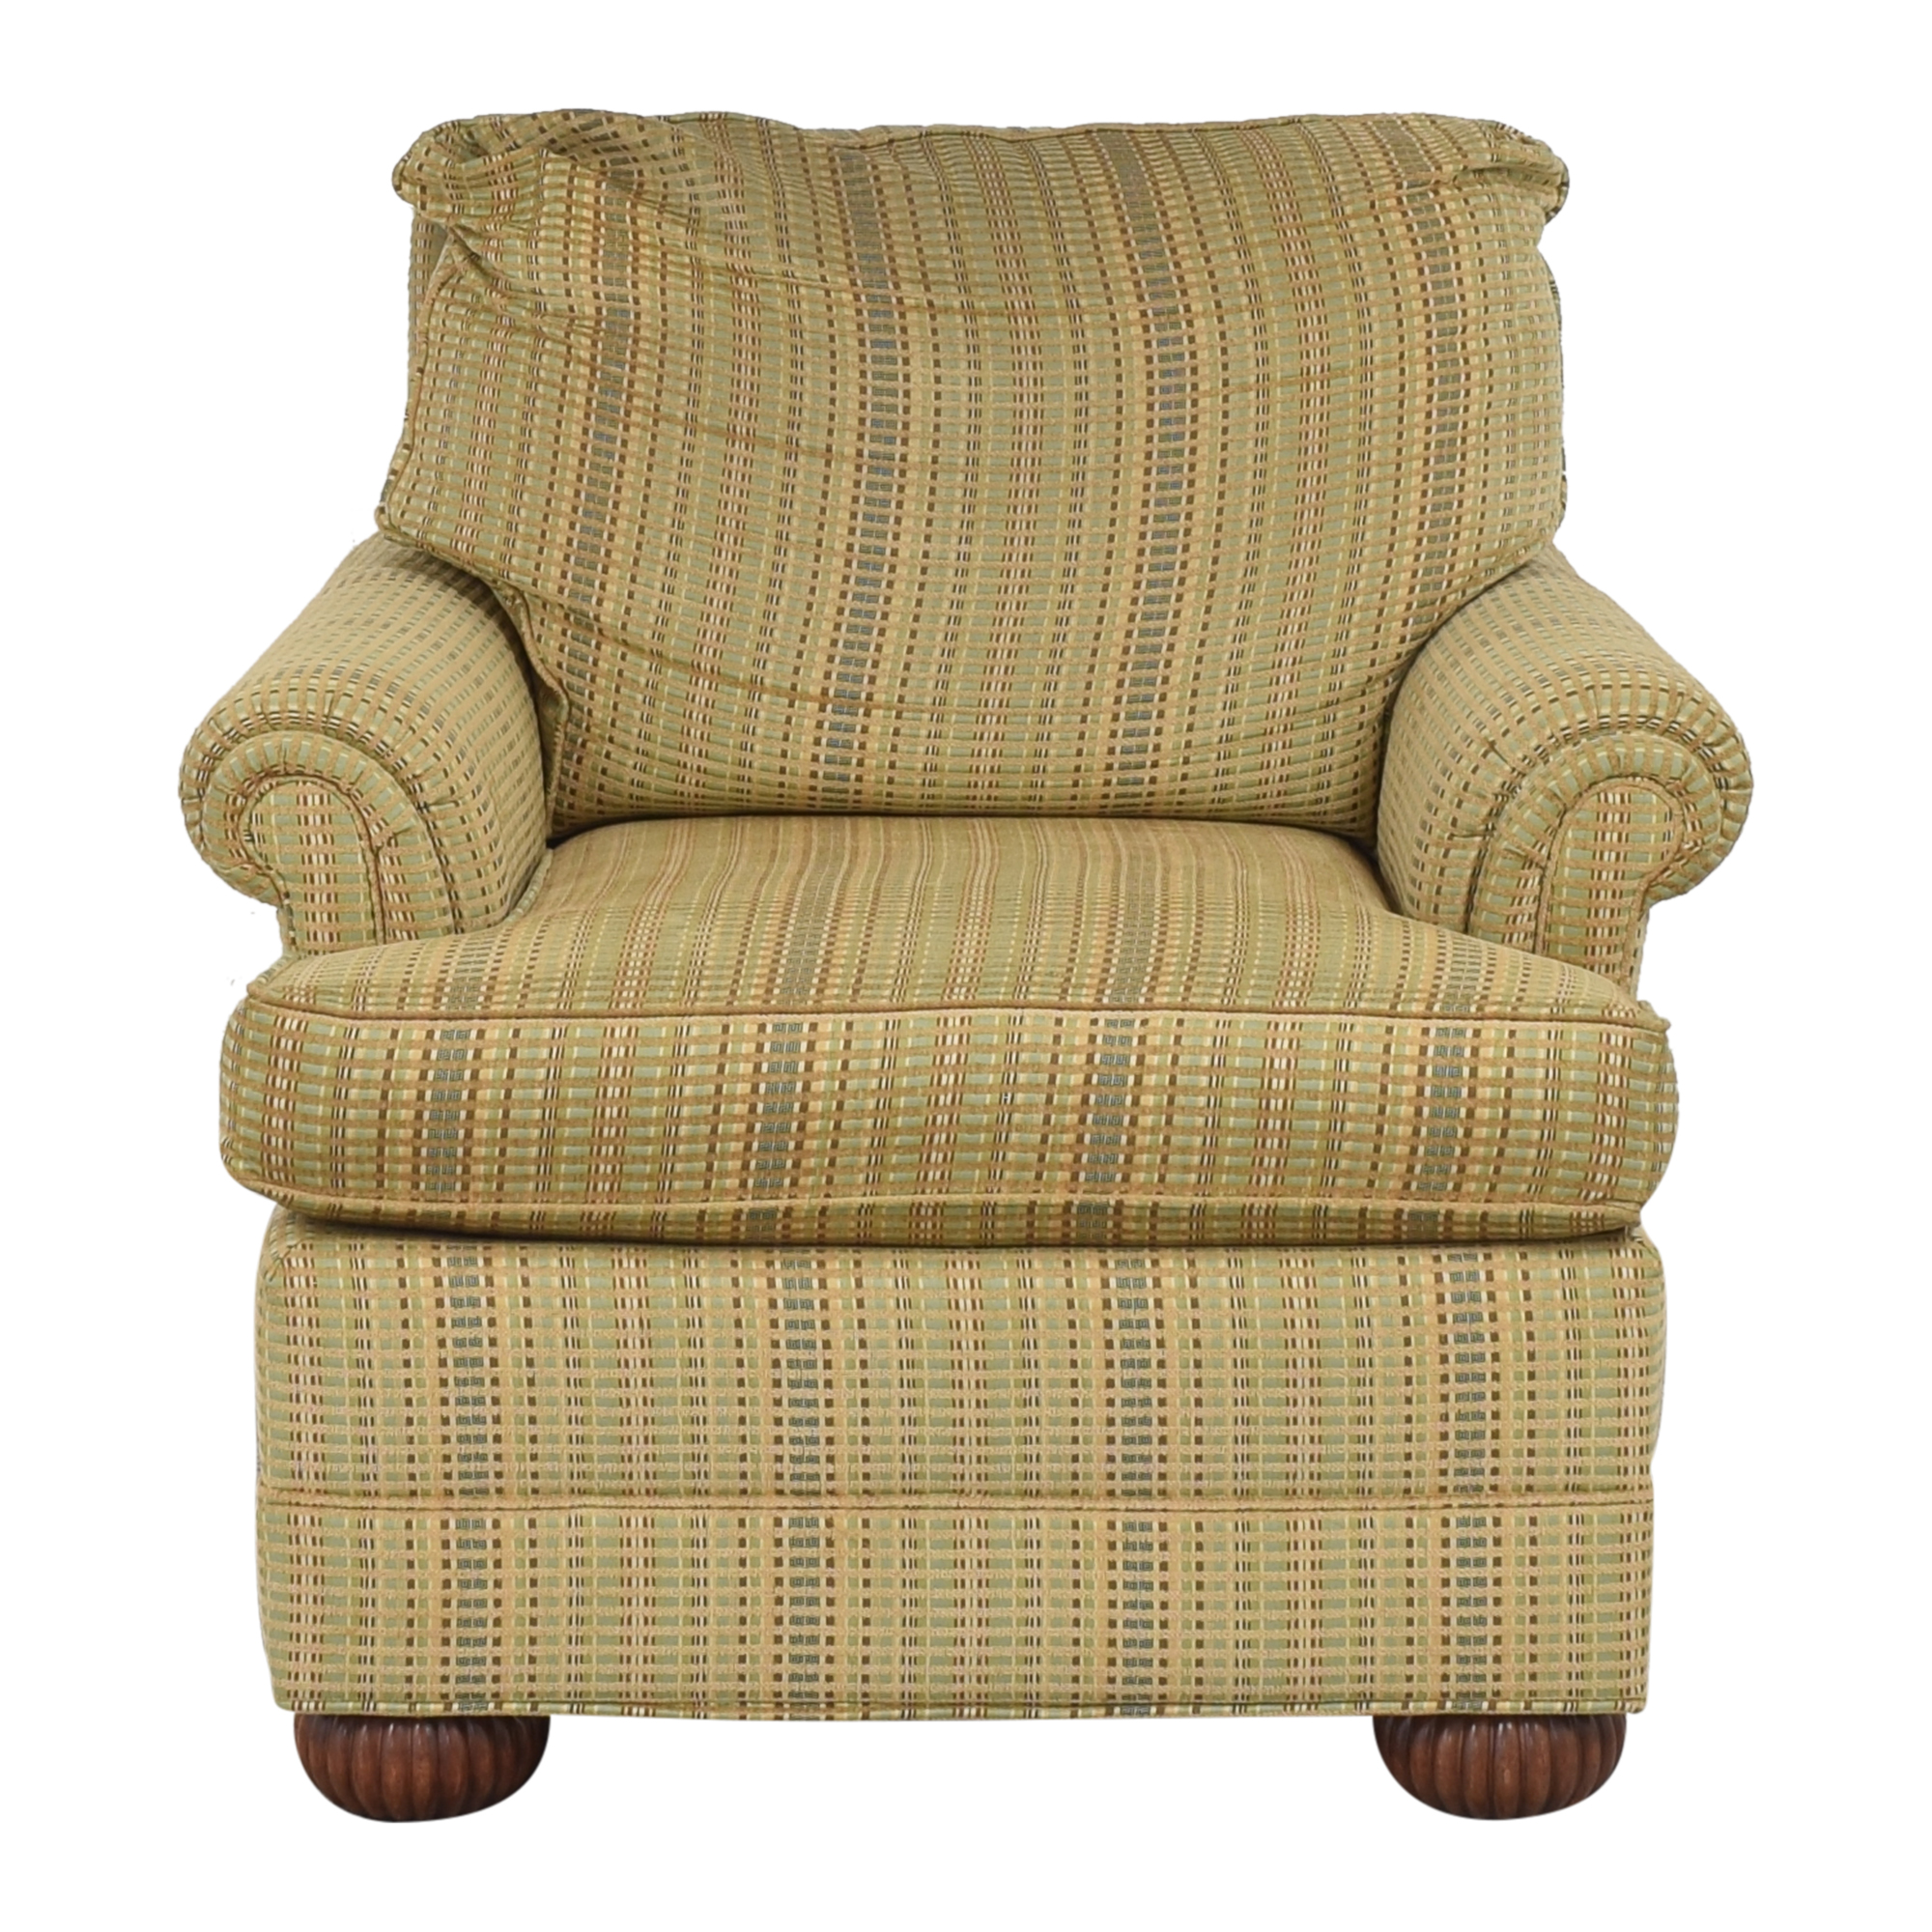 Ethan Allen Ethan Allen Striped Accent Chair dimensions